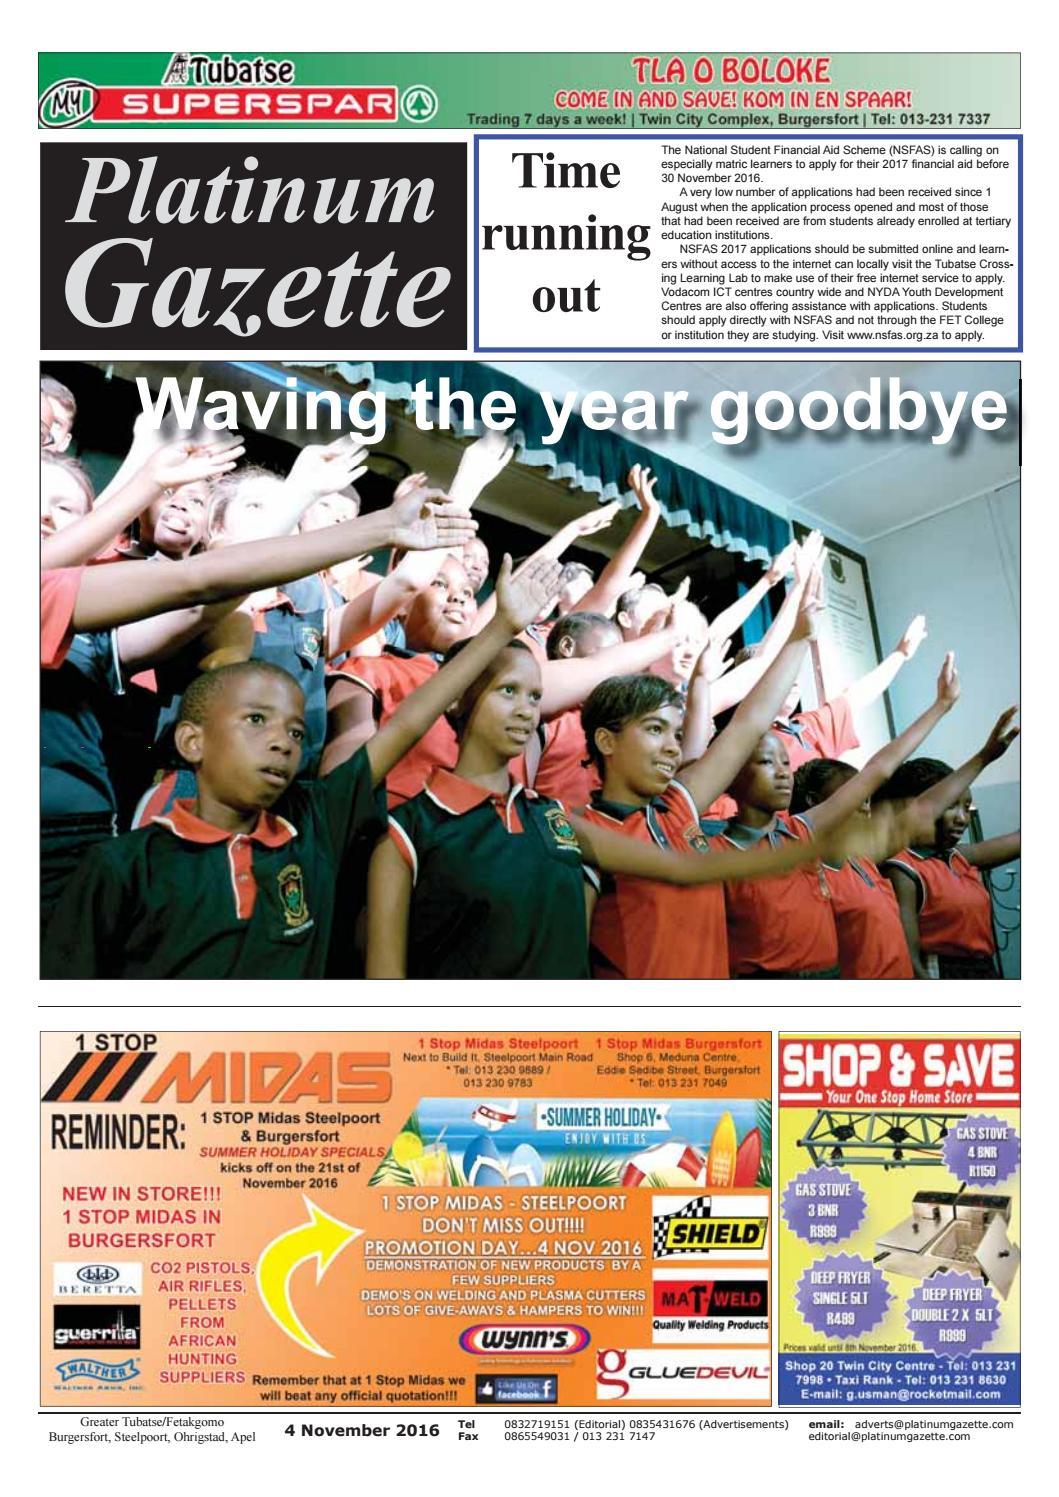 dfbac530437440 Platinum Gazette 04 November 2016 by Platinum Gazette - issuu